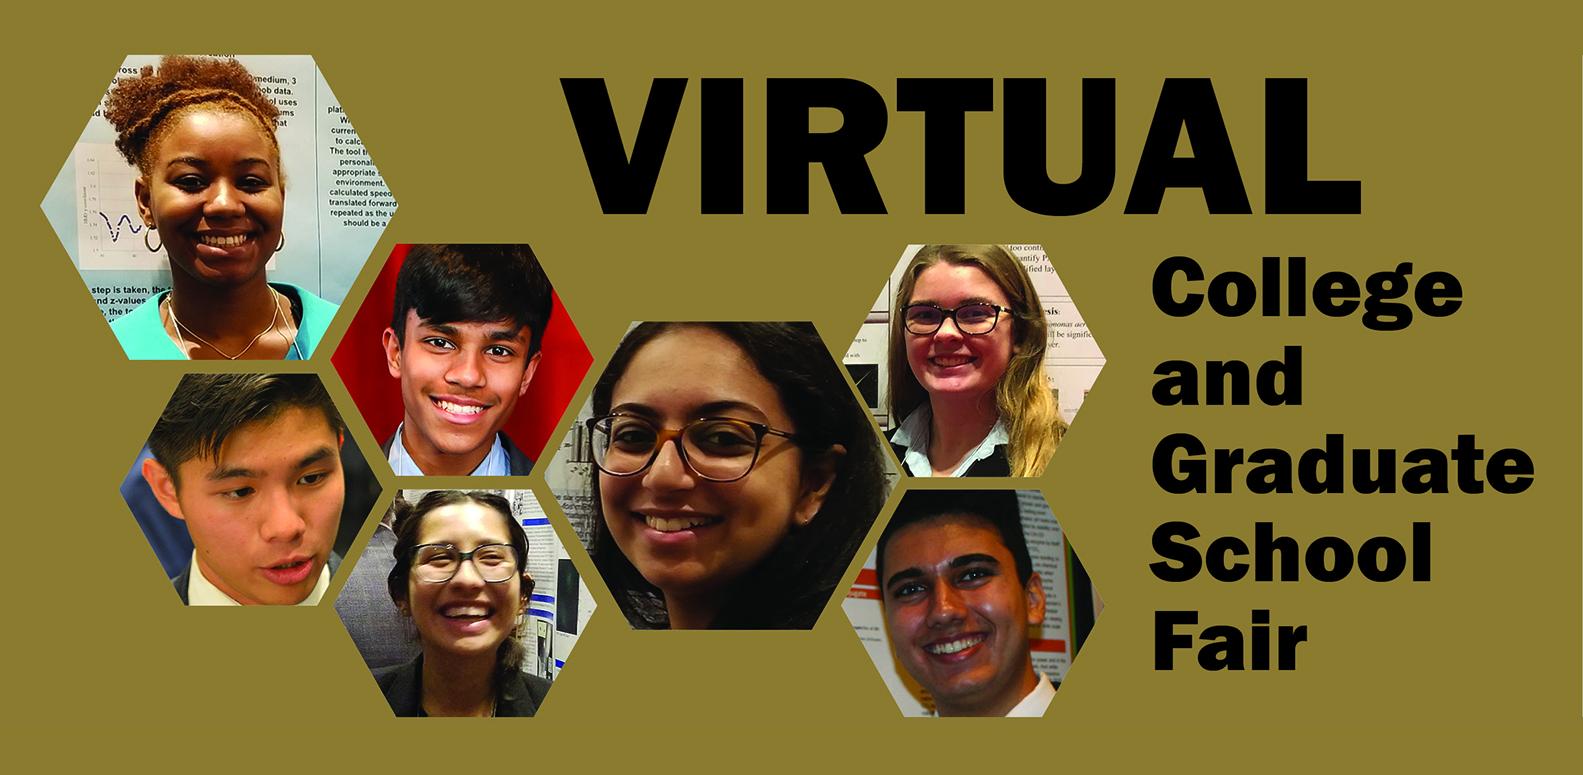 College and Graduate School Fair Virtual